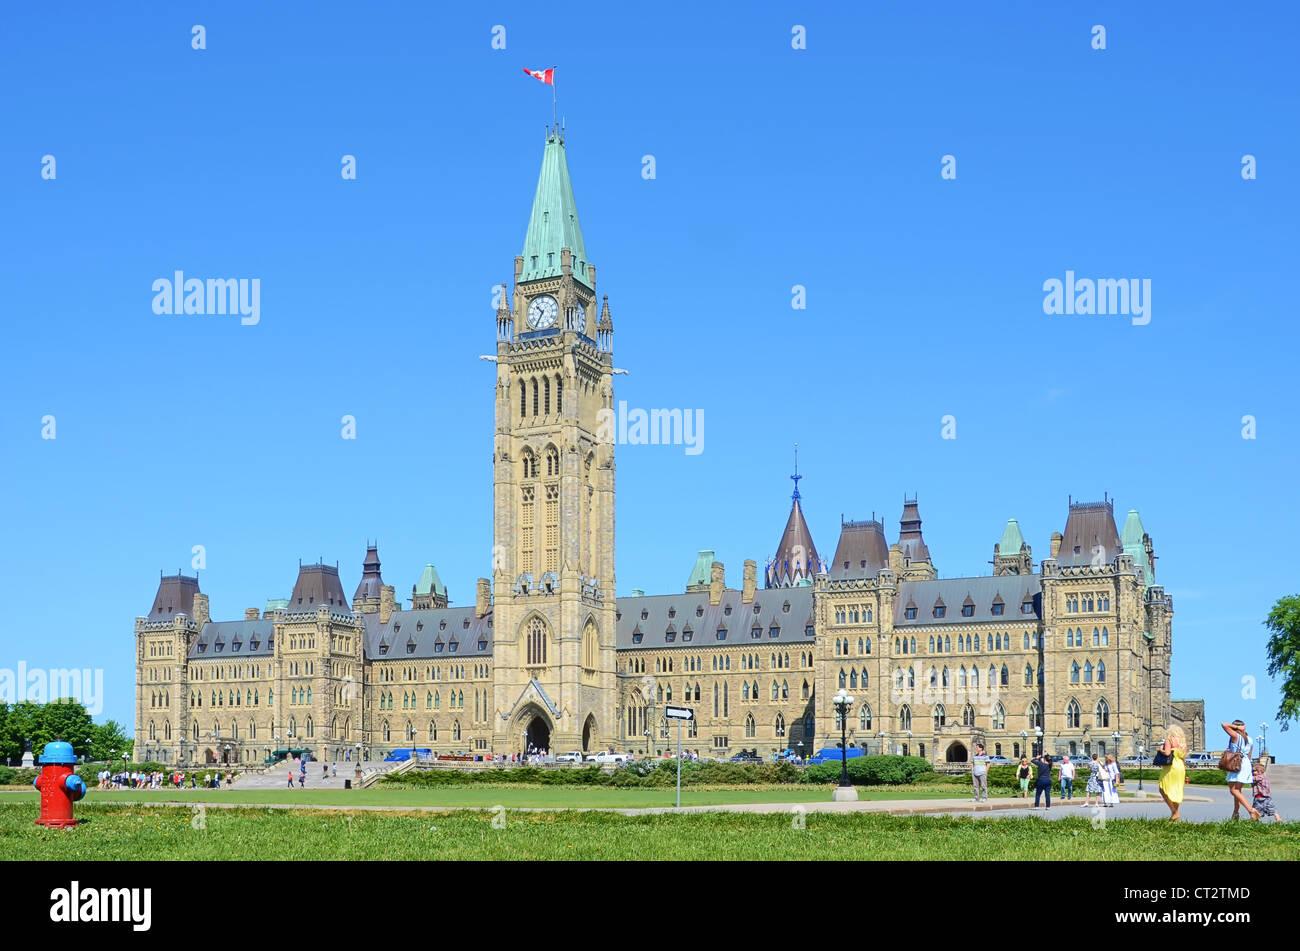 The Parliamentary Buildings at Ottawa, Ontario, Canada. - Stock Image